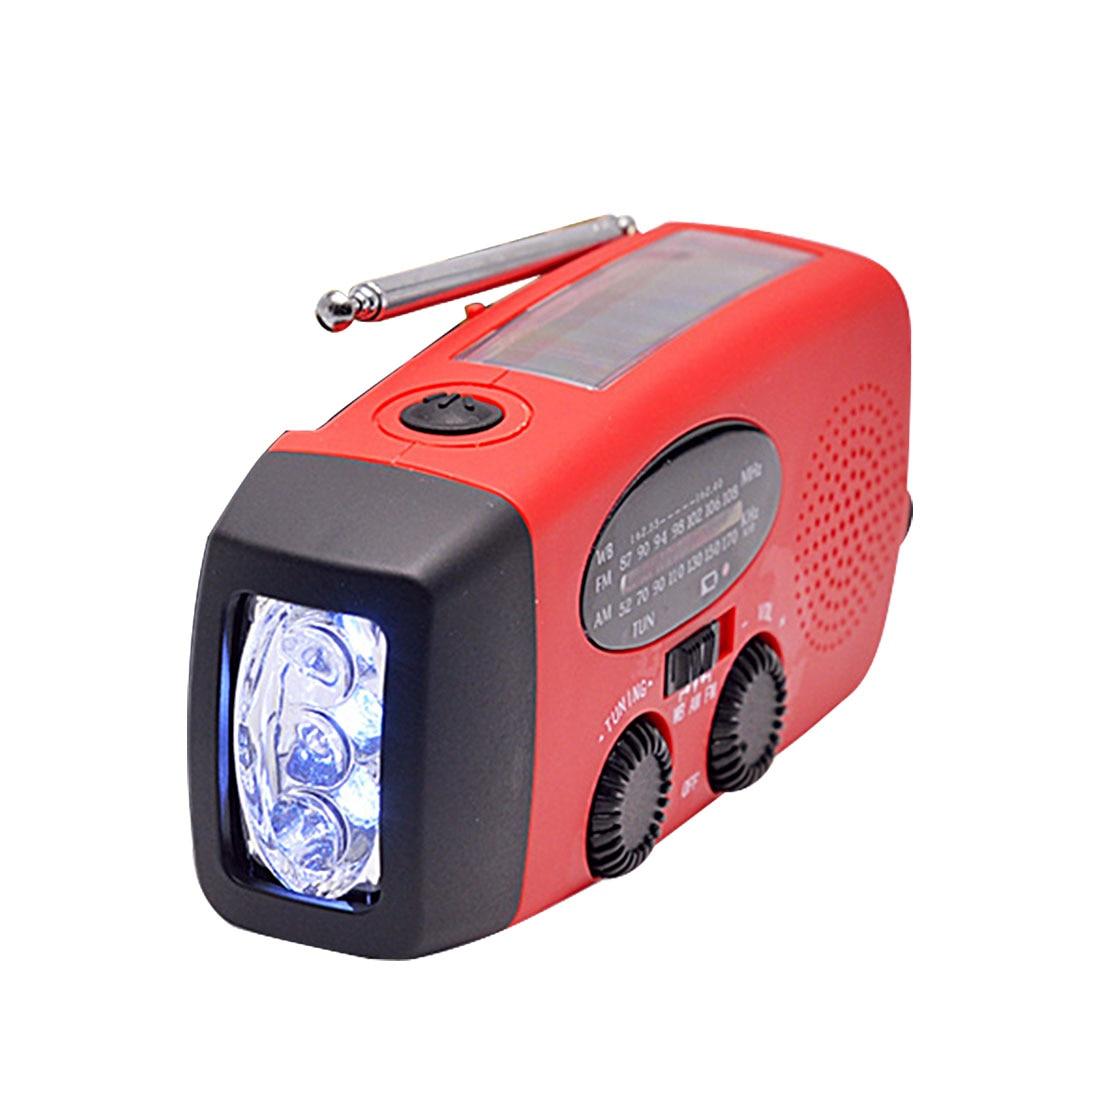 Candid Marsnaska Table Solar Radio Hand Crank Self Powered Phone Charger 3 Led Flashlight Am/fm/wb Radio Waterof Emergency Survival Red Radio Portable Audio & Video